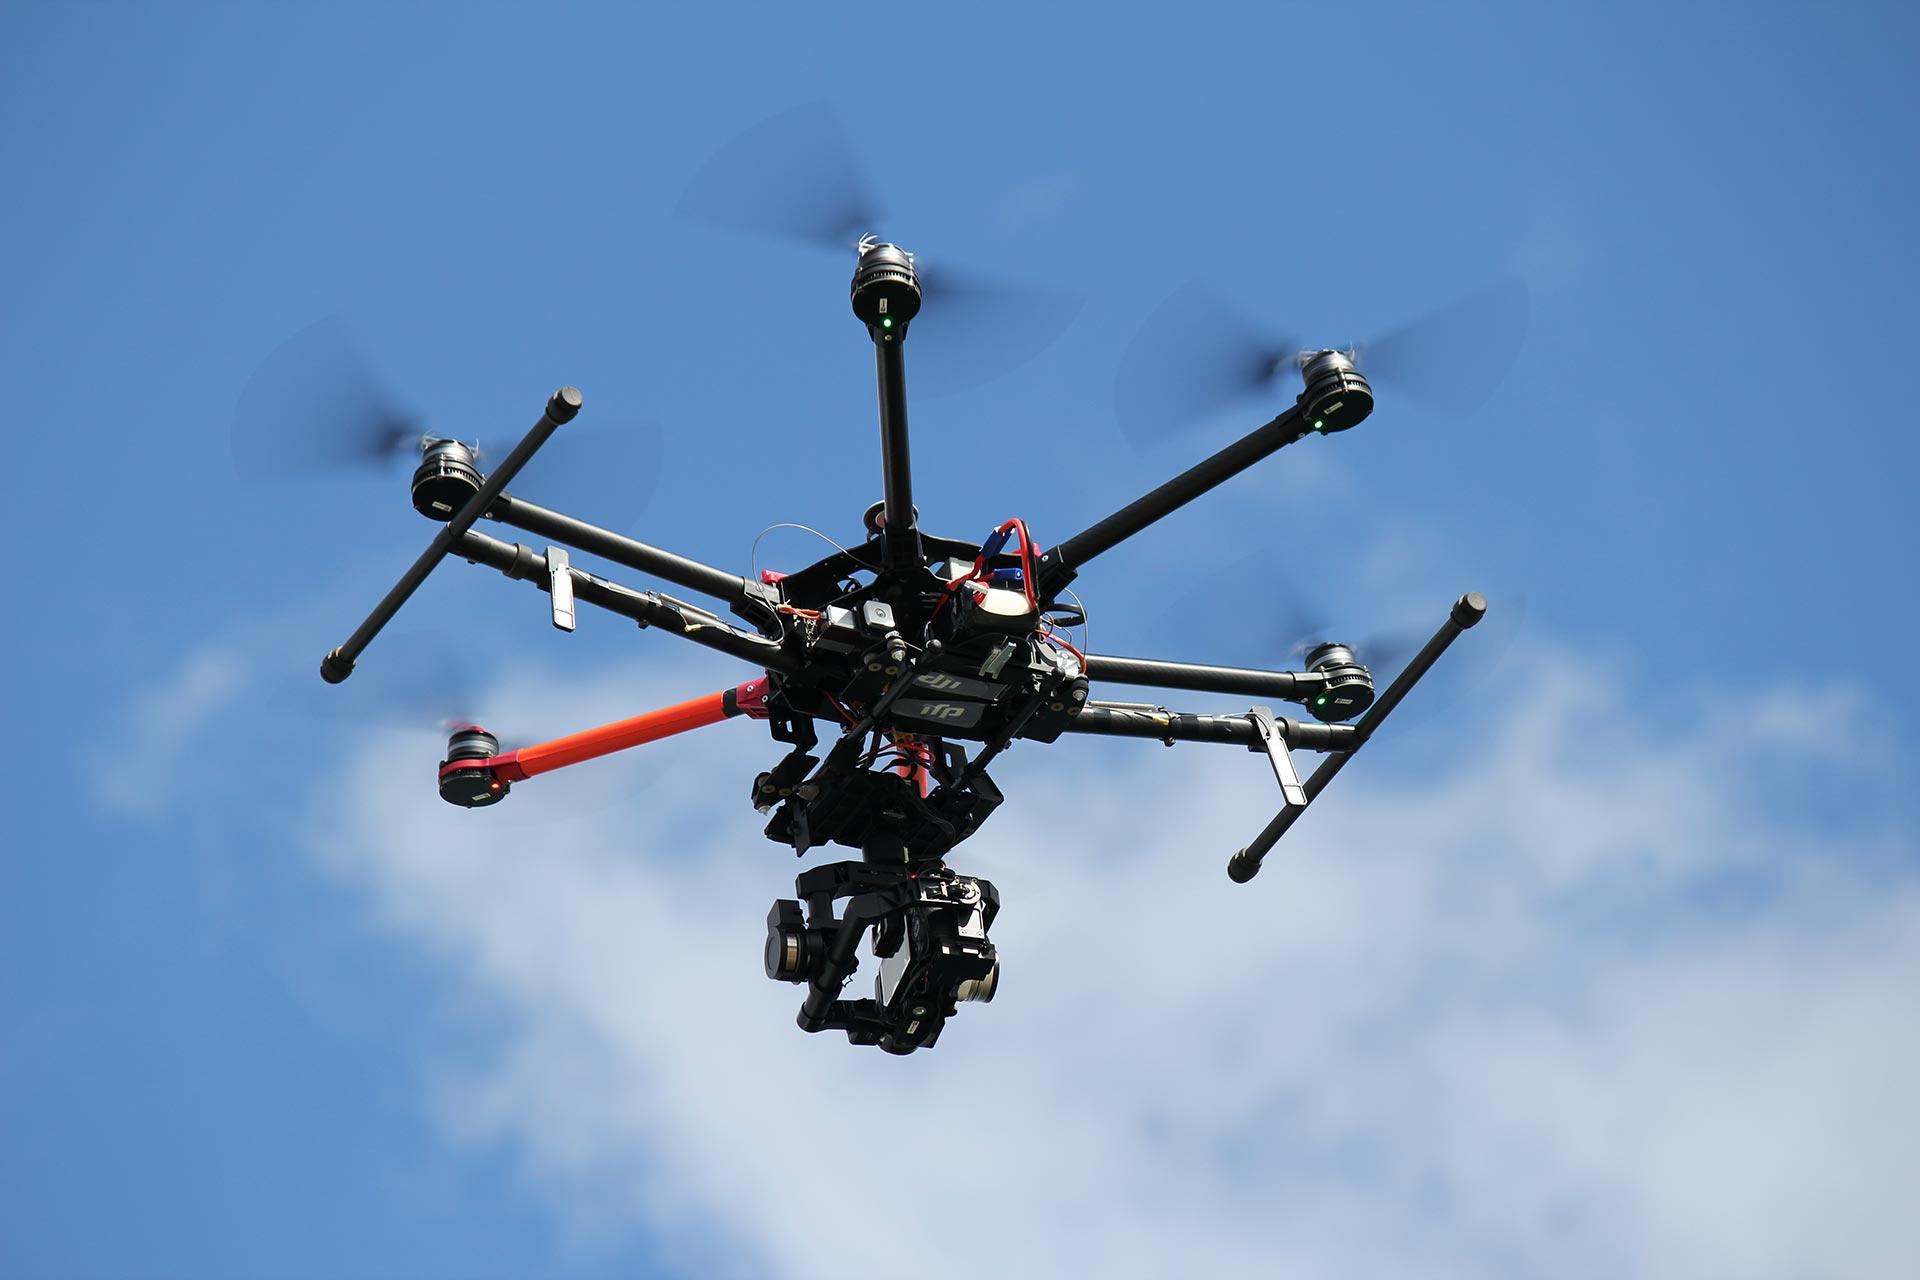 Drone camera in flight